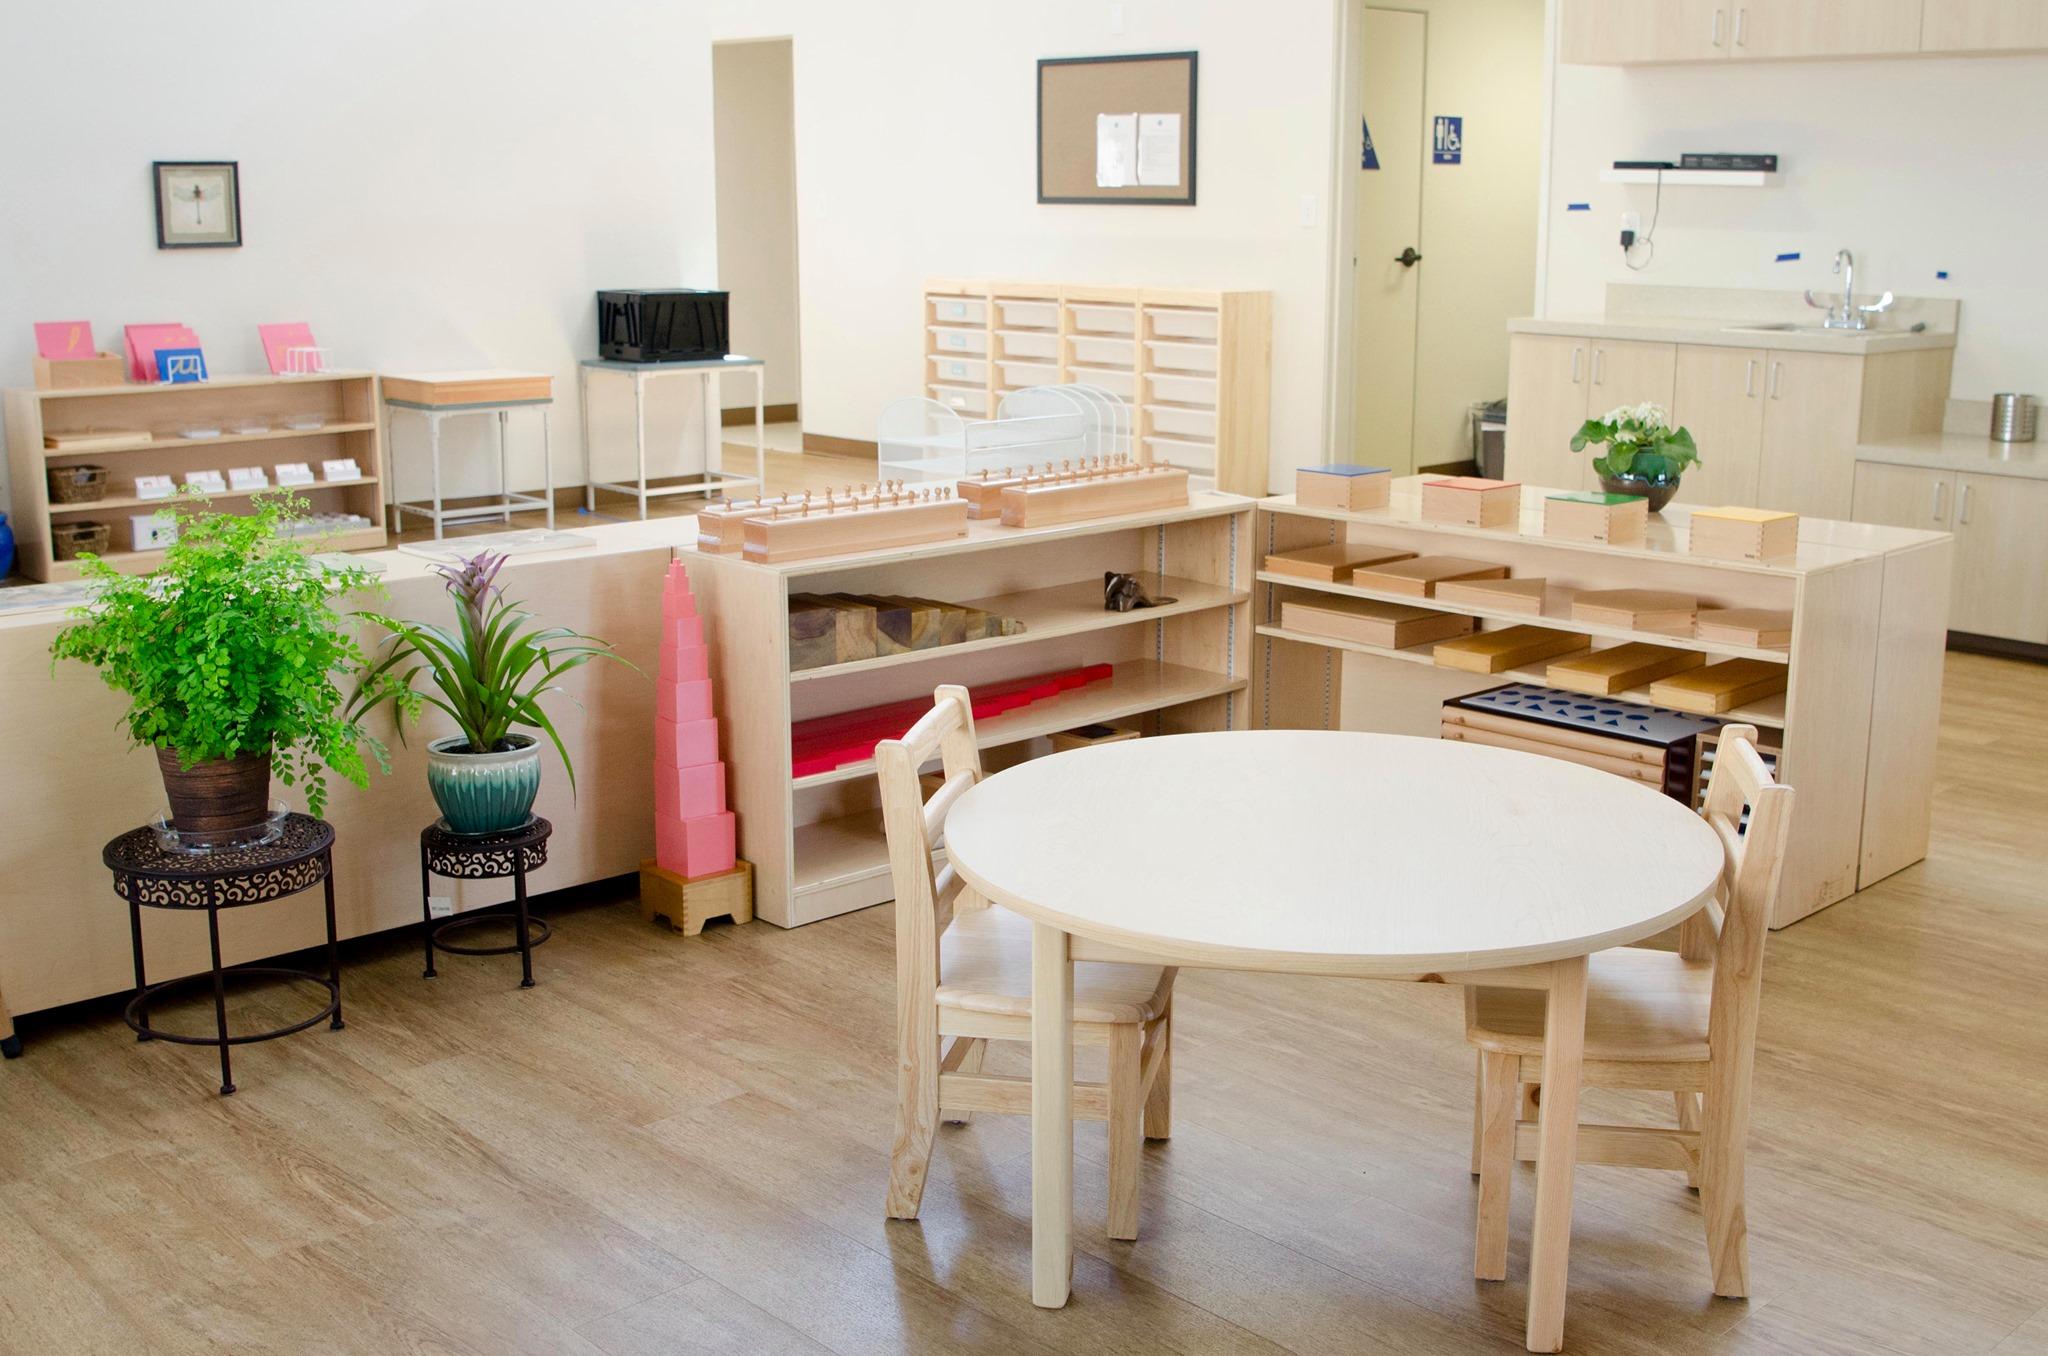 NEWS - Guidepost Montessori Opens New Alexandria Campus